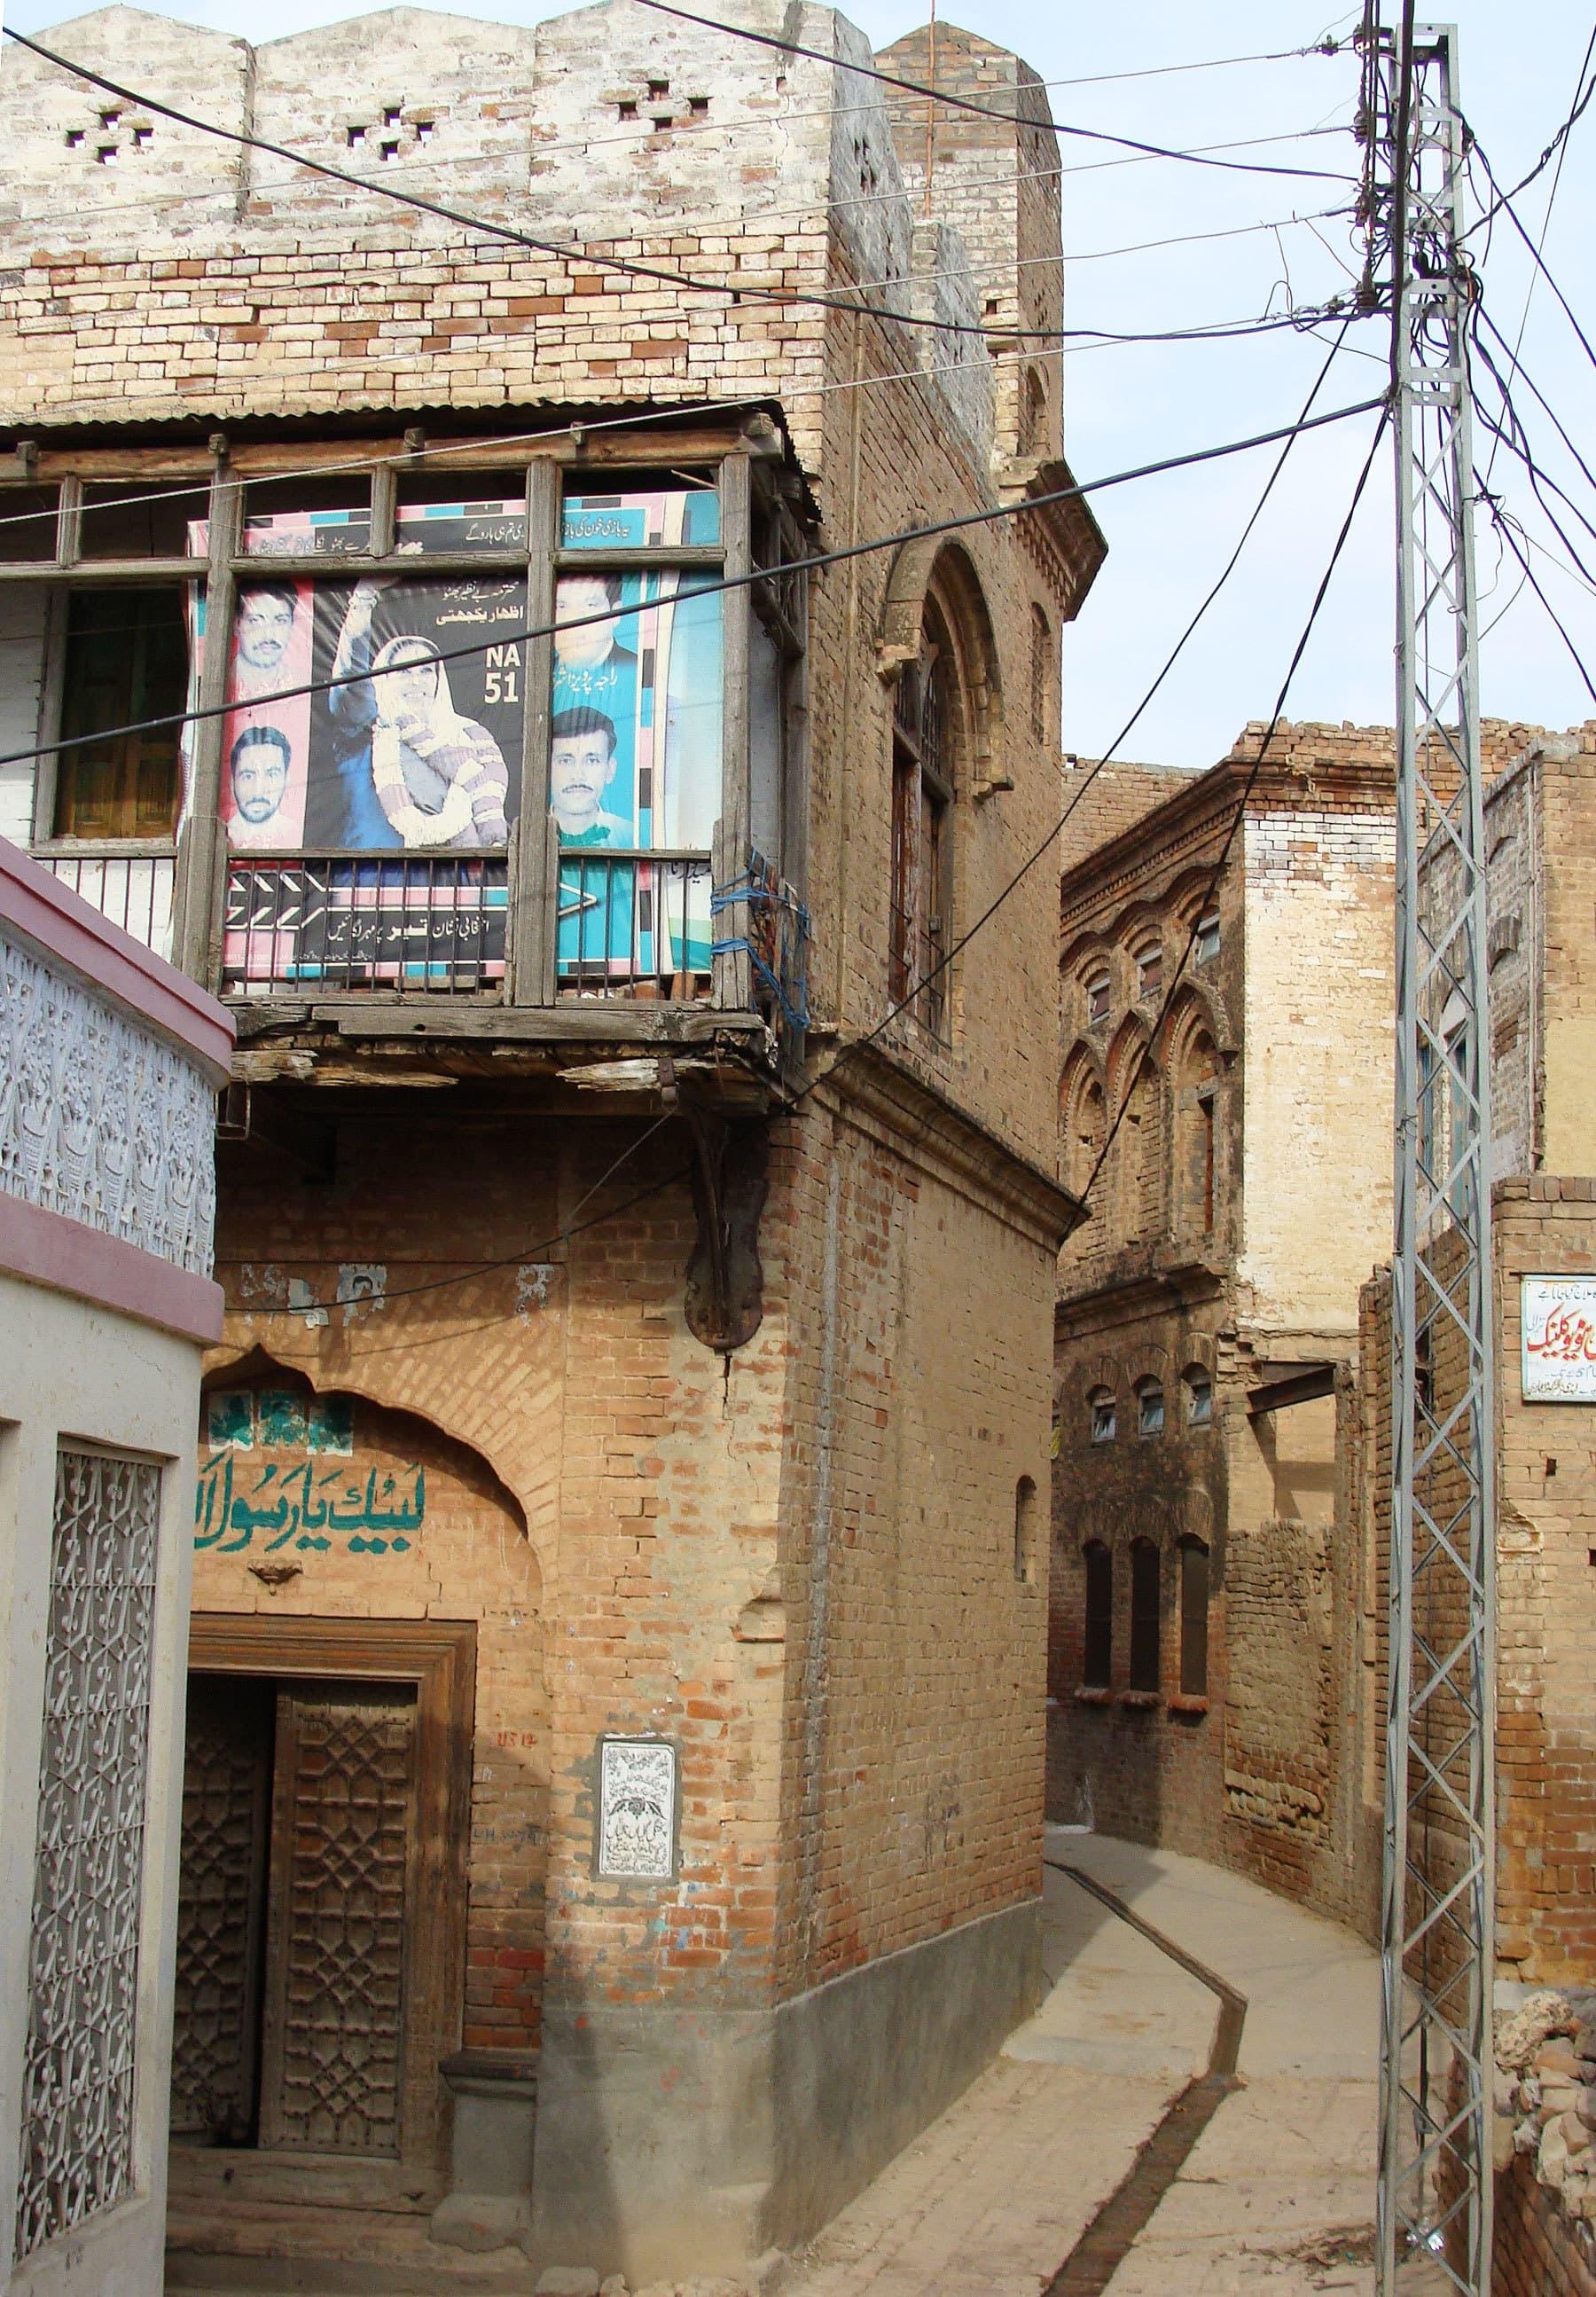 The narrow alleys of Narali.